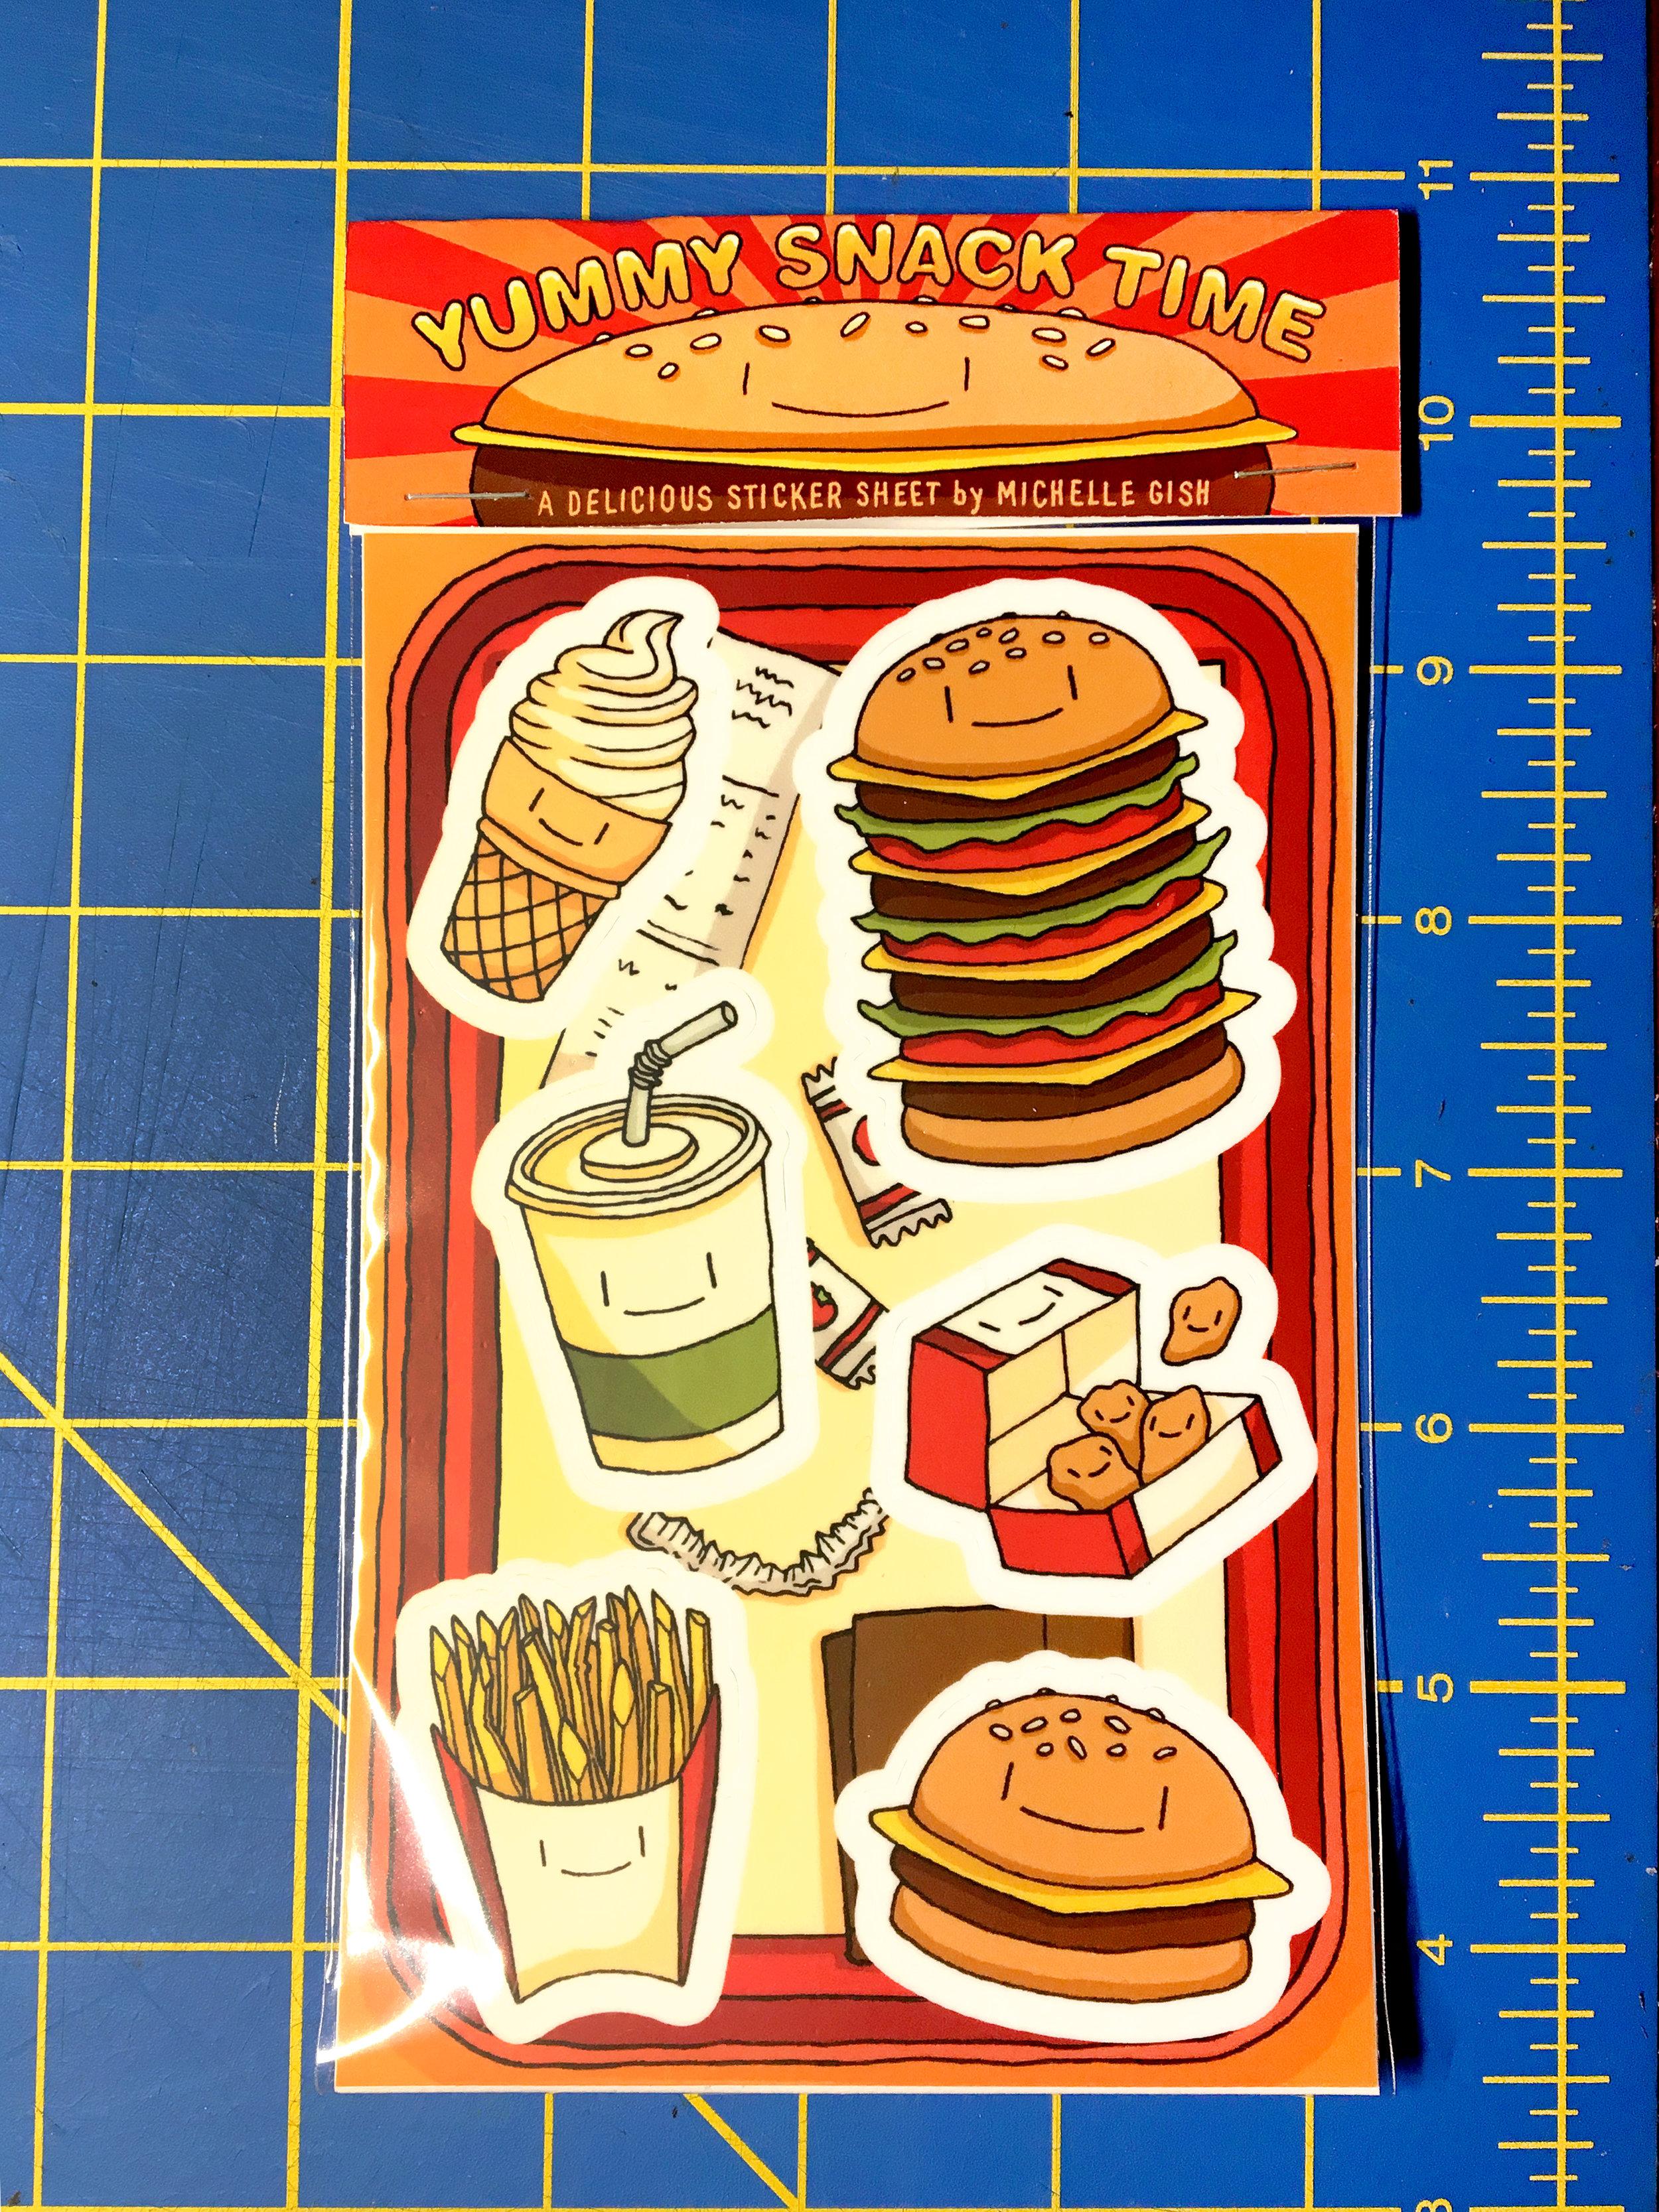 Yummy Snack Time sticker sheet!